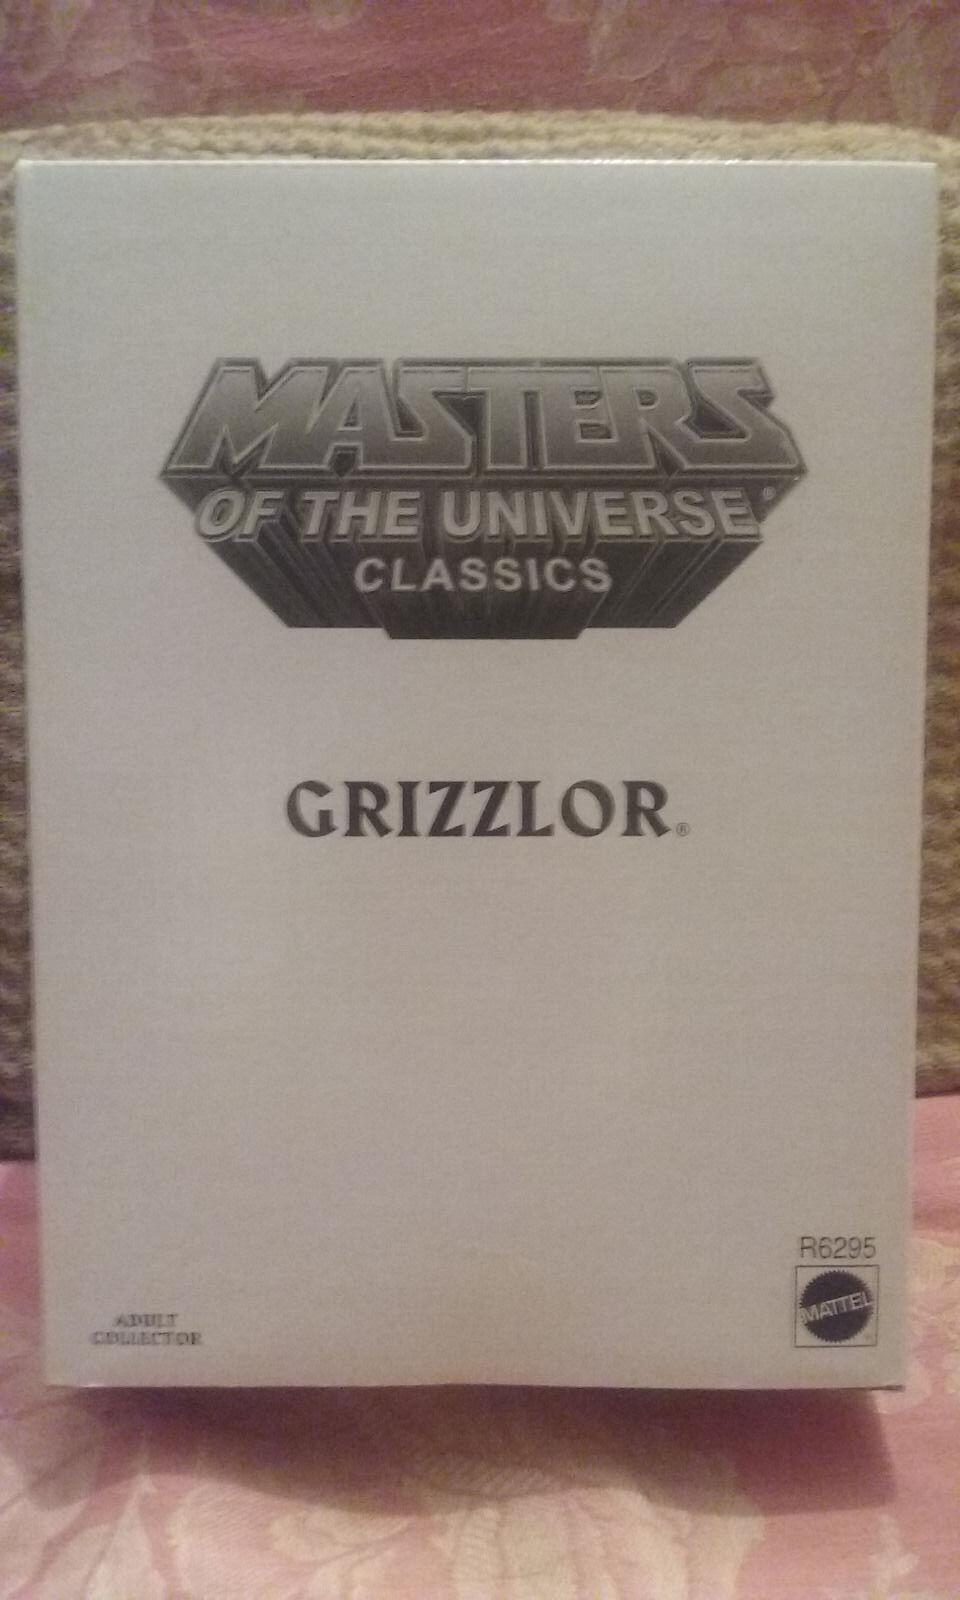 Maitres de l'Univers MOTU classeics - Grizzlor - masters of of of universe NEUF edaf3e